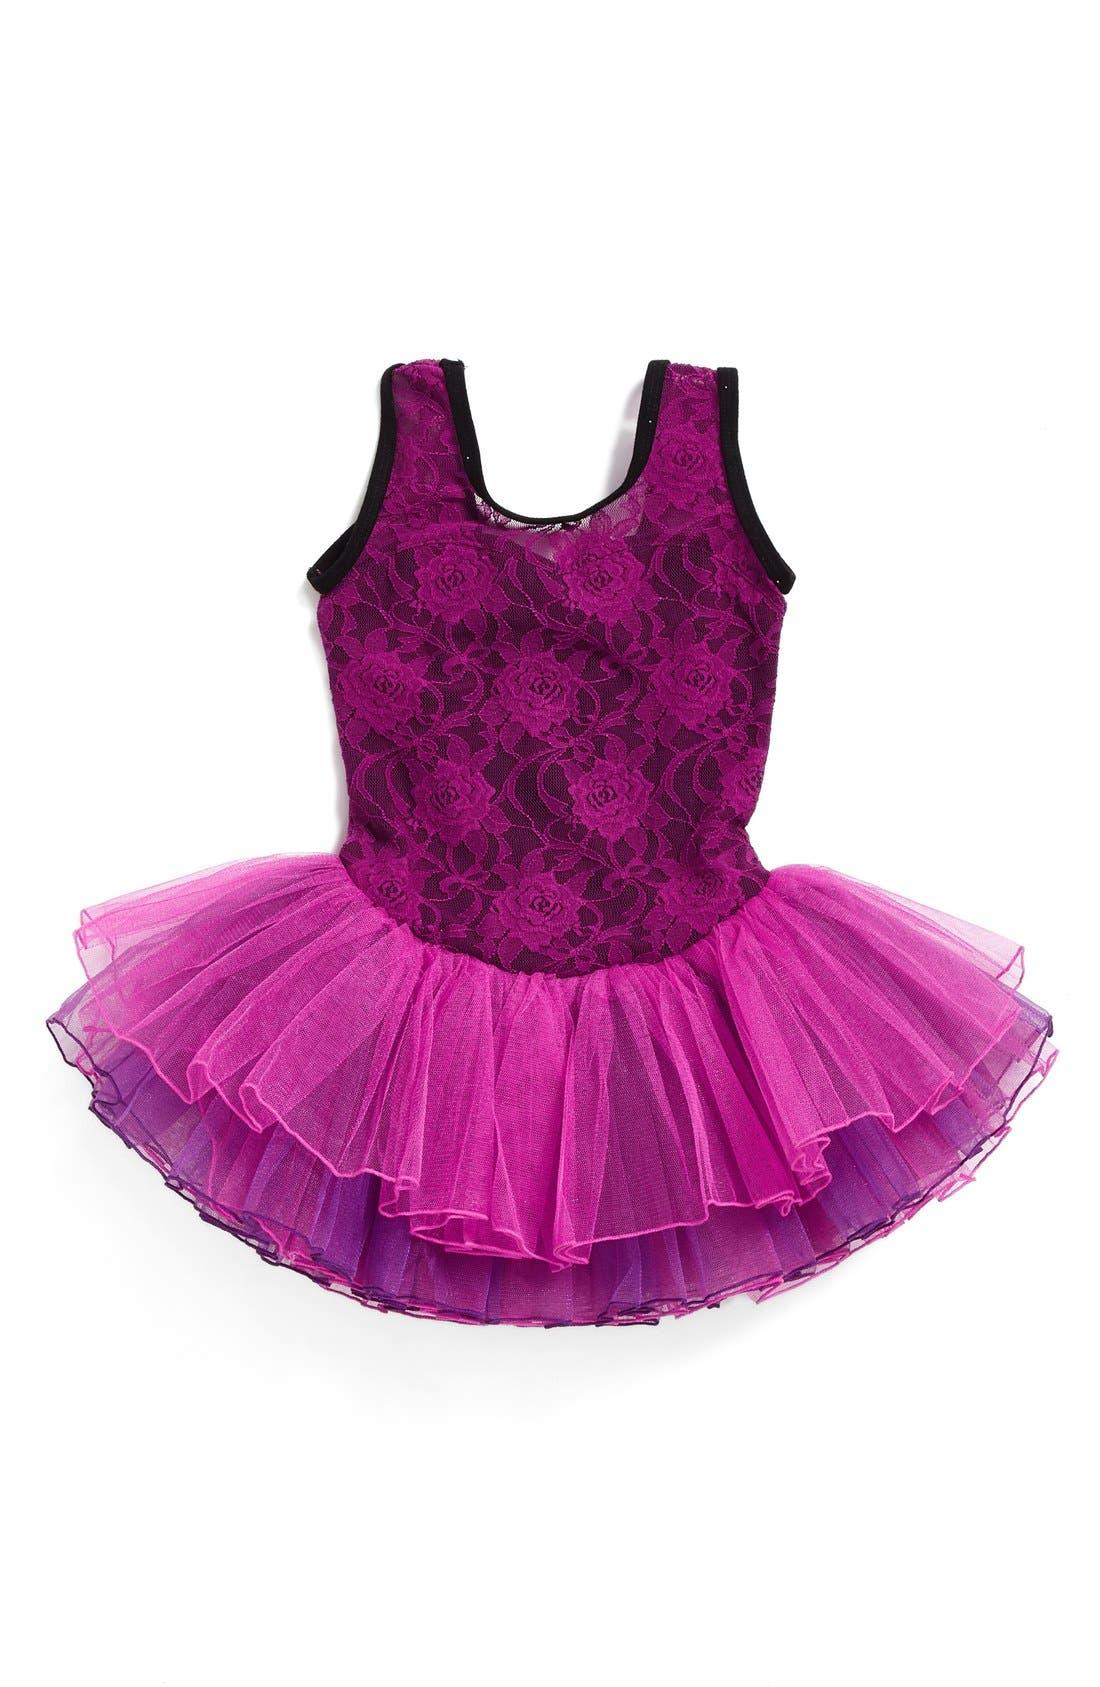 Alternate Image 1 Selected - Popatu Lace Tutu Dress (Baby Girls)